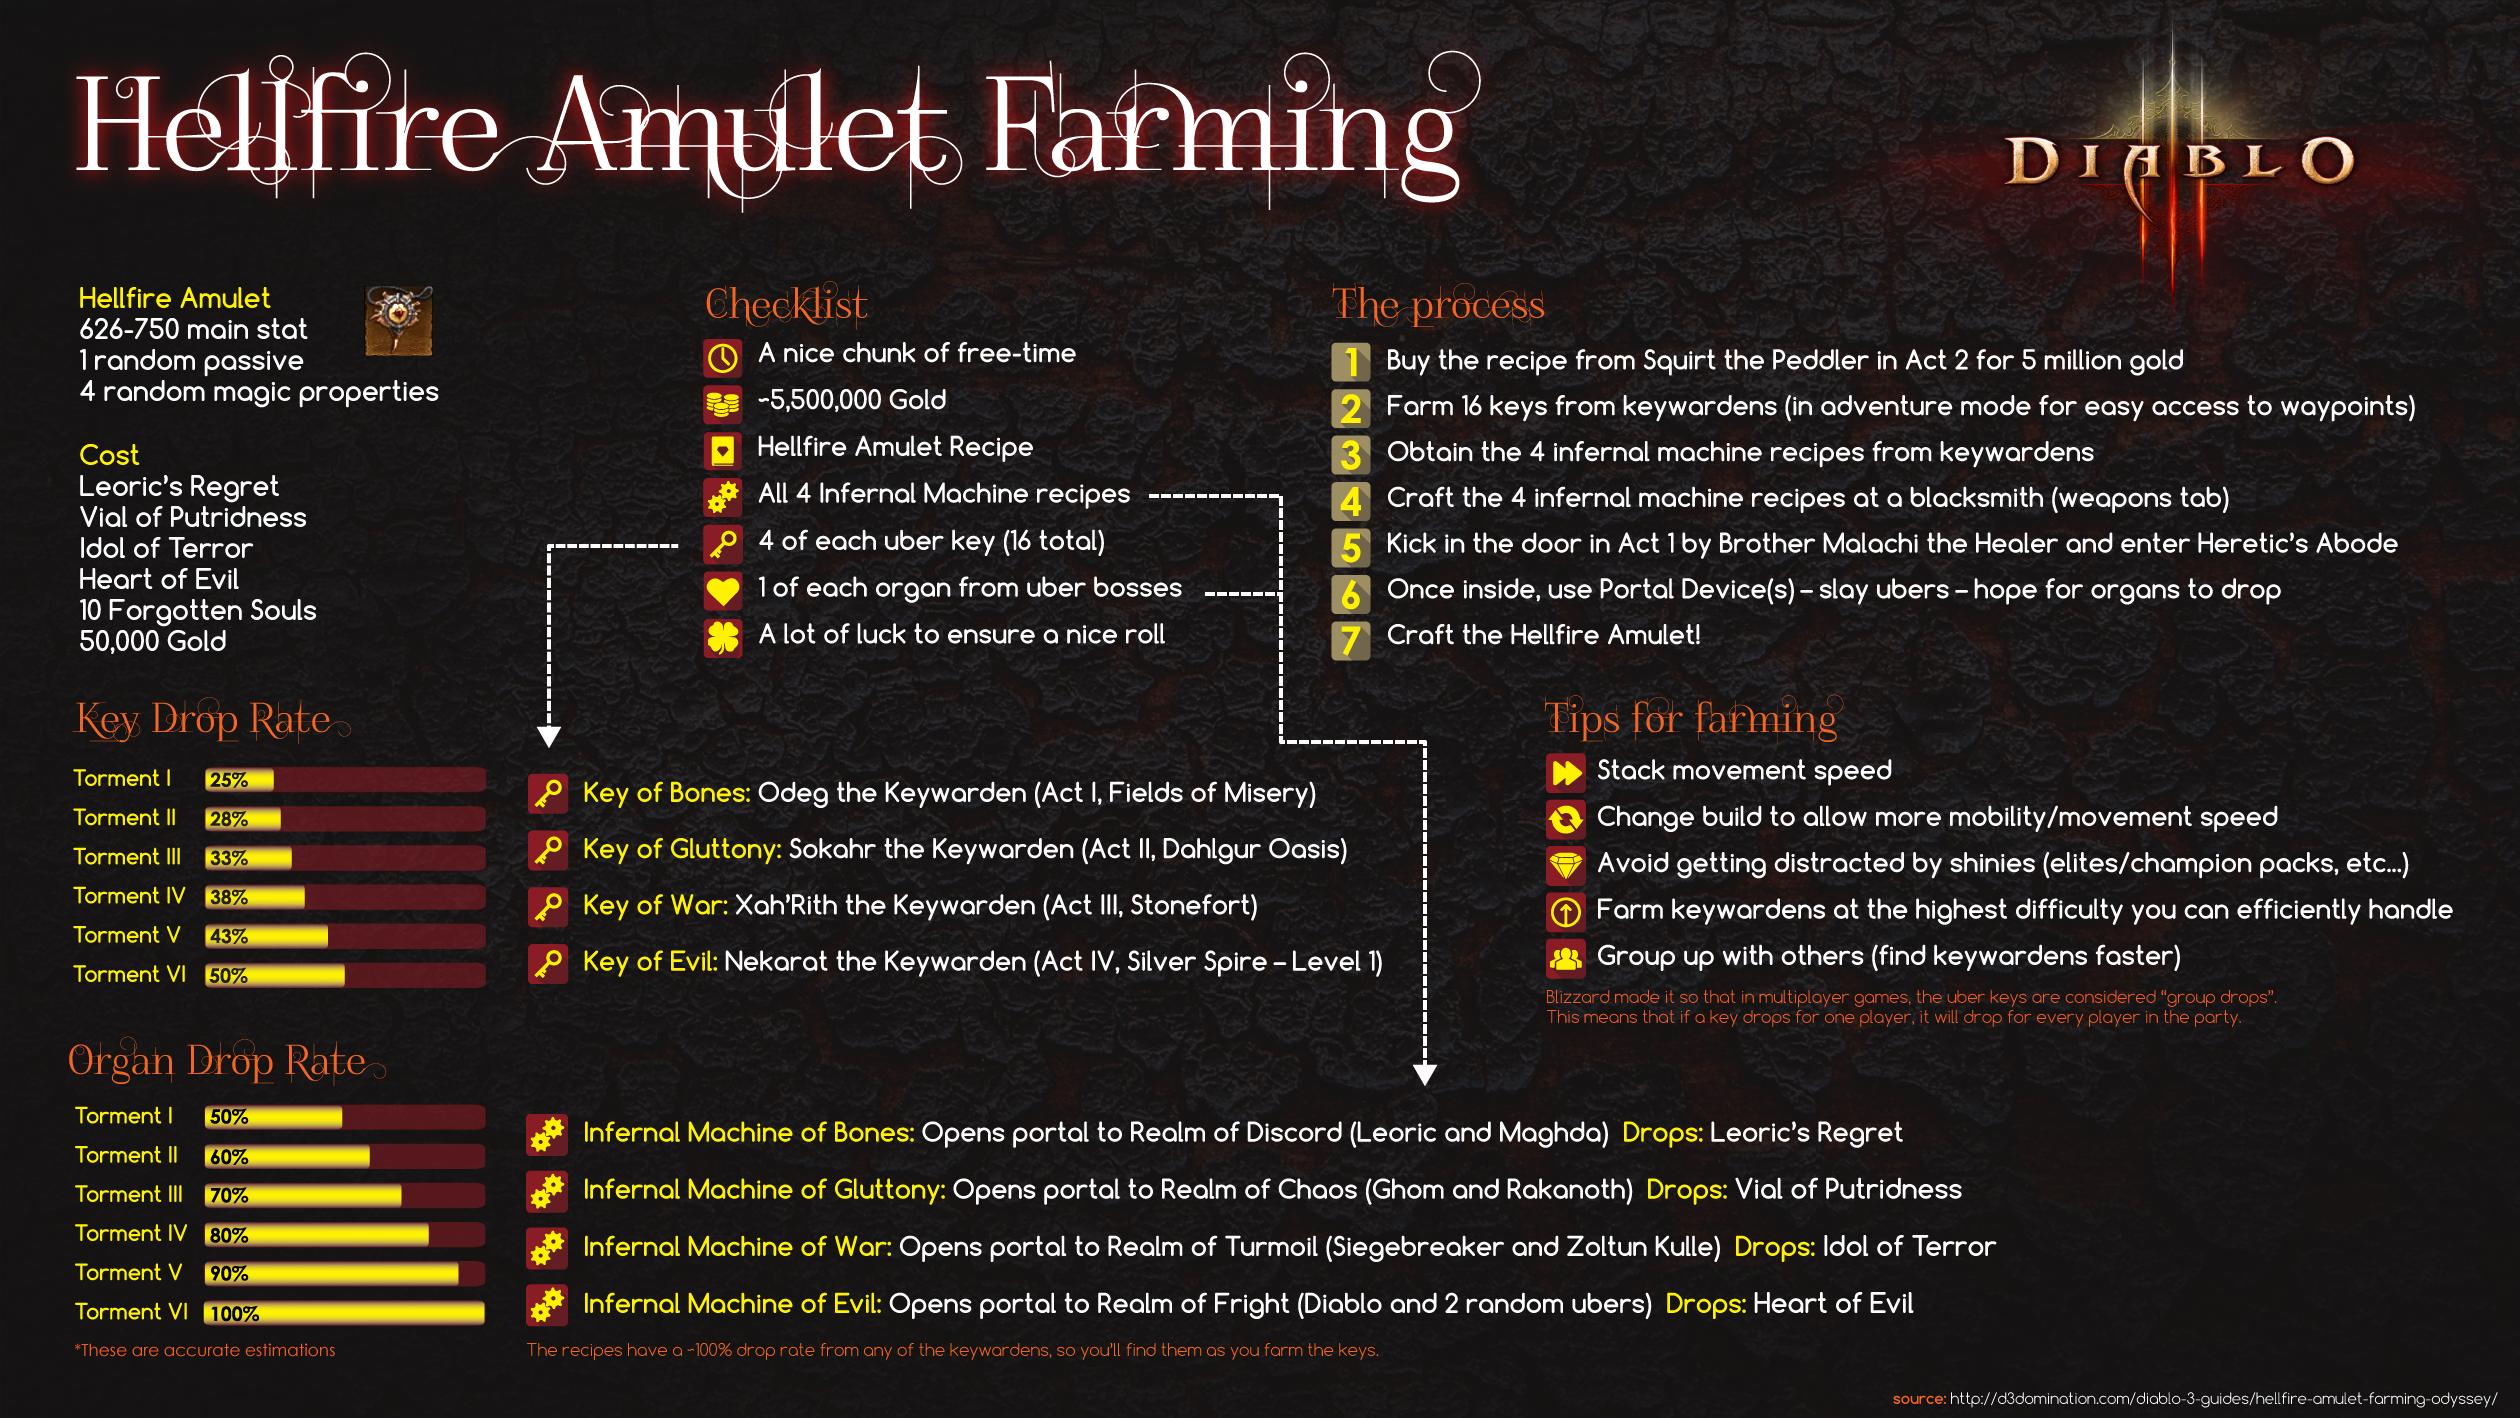 Hellfire Amulet Farming Infographic Diablo Iii General Discussion Diablo Forums Forums Diablofans